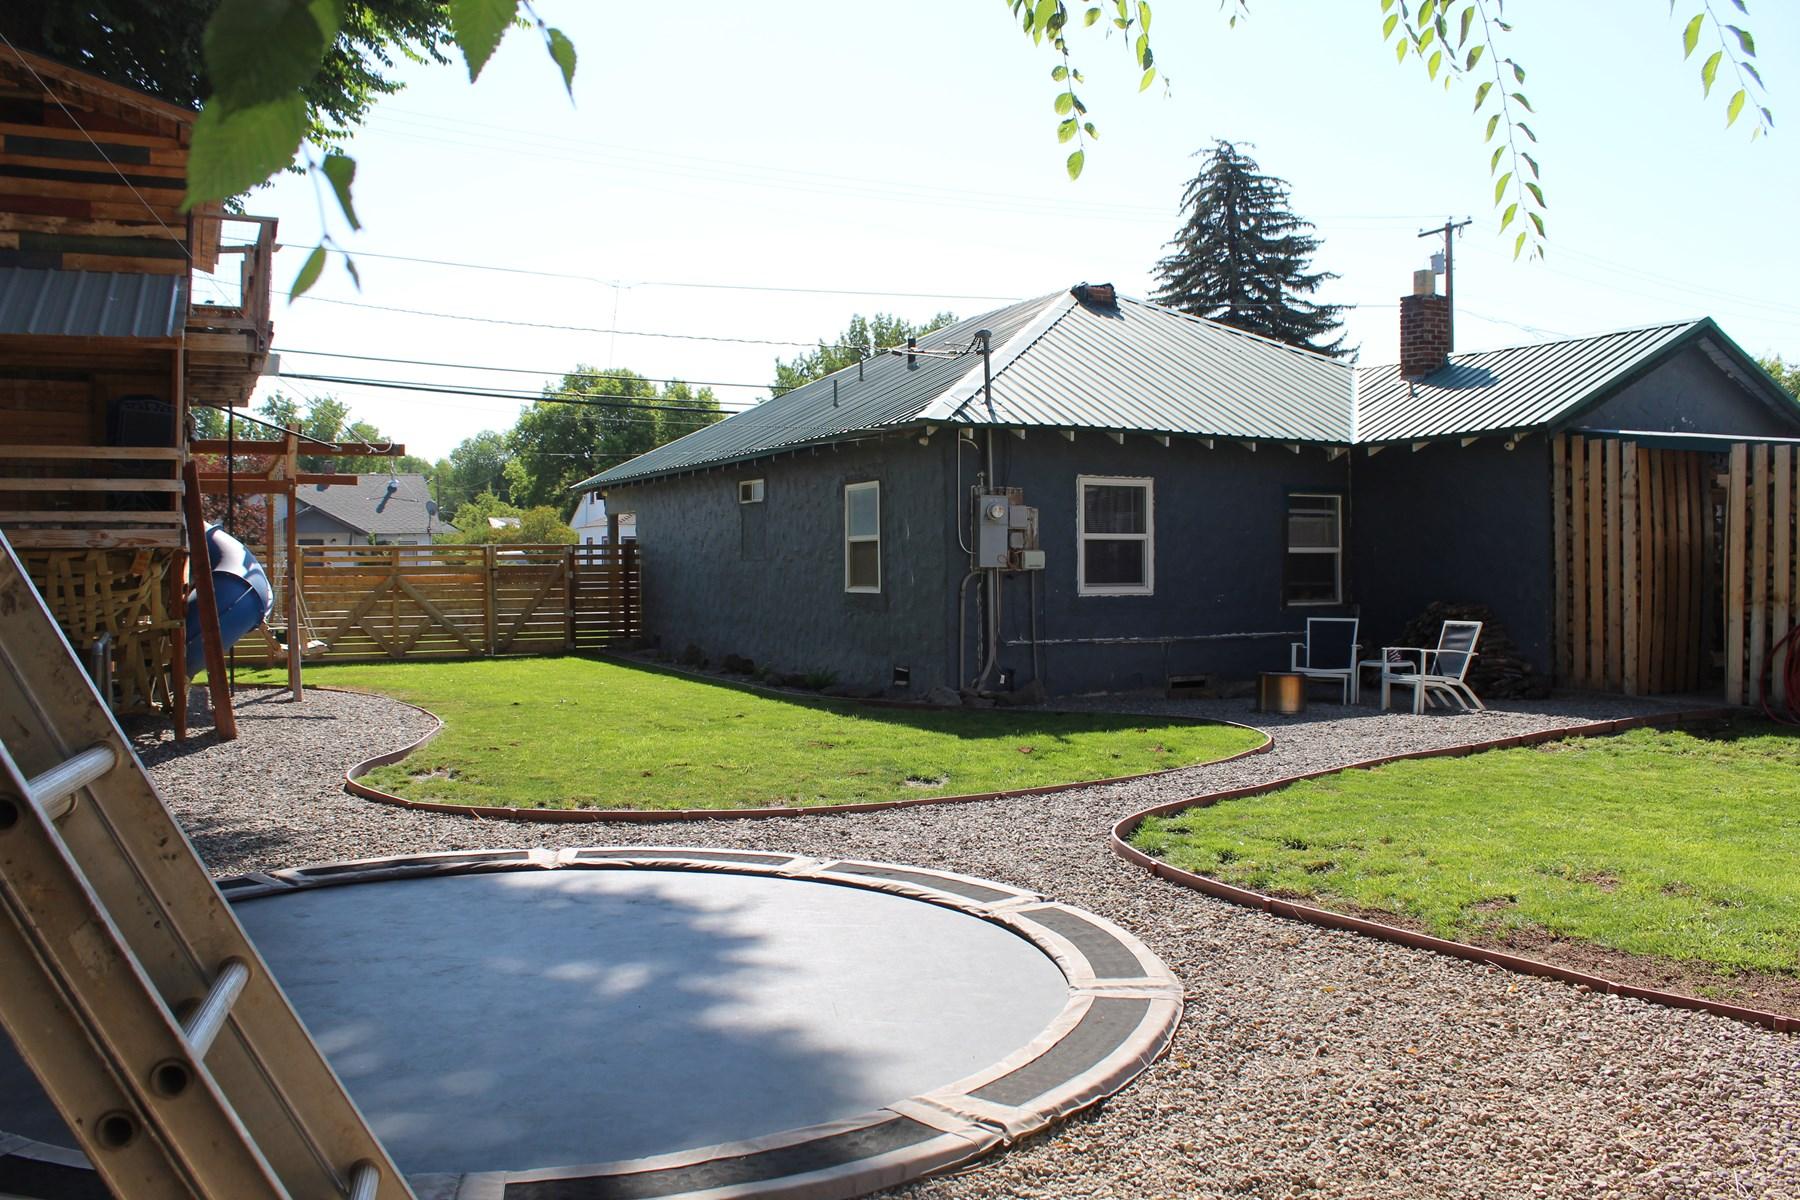 Starter Home in Alturas, CA for Sale